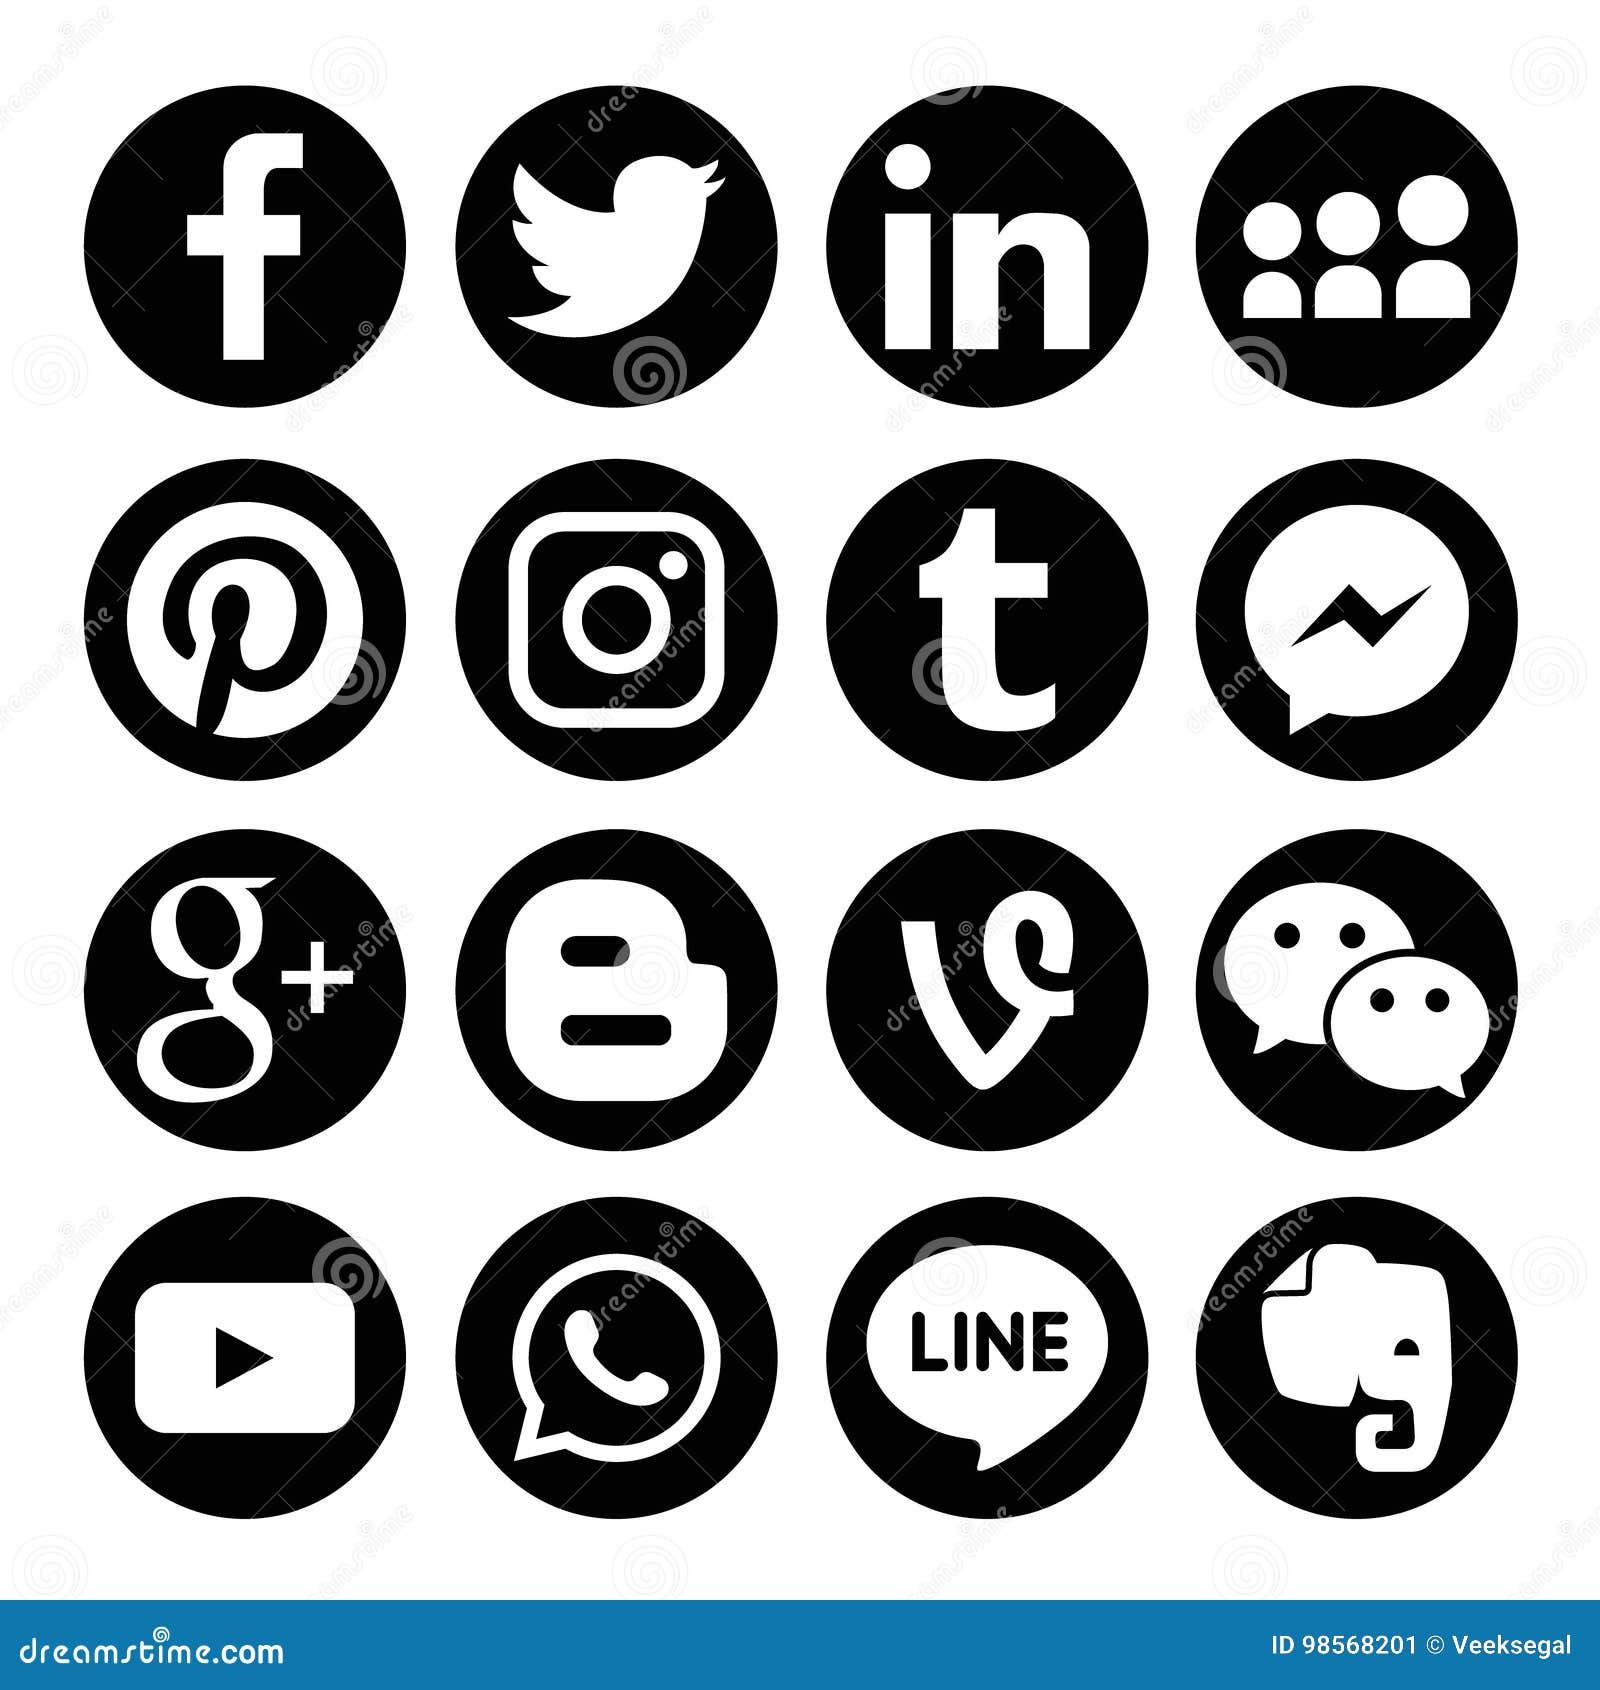 5ec6aebe14b9 Set of popular social media logos vector web icon Facebook, Twitter,  Instagram, Pinterest, Tumblr, LinkedIn, Google Plus, Blogger